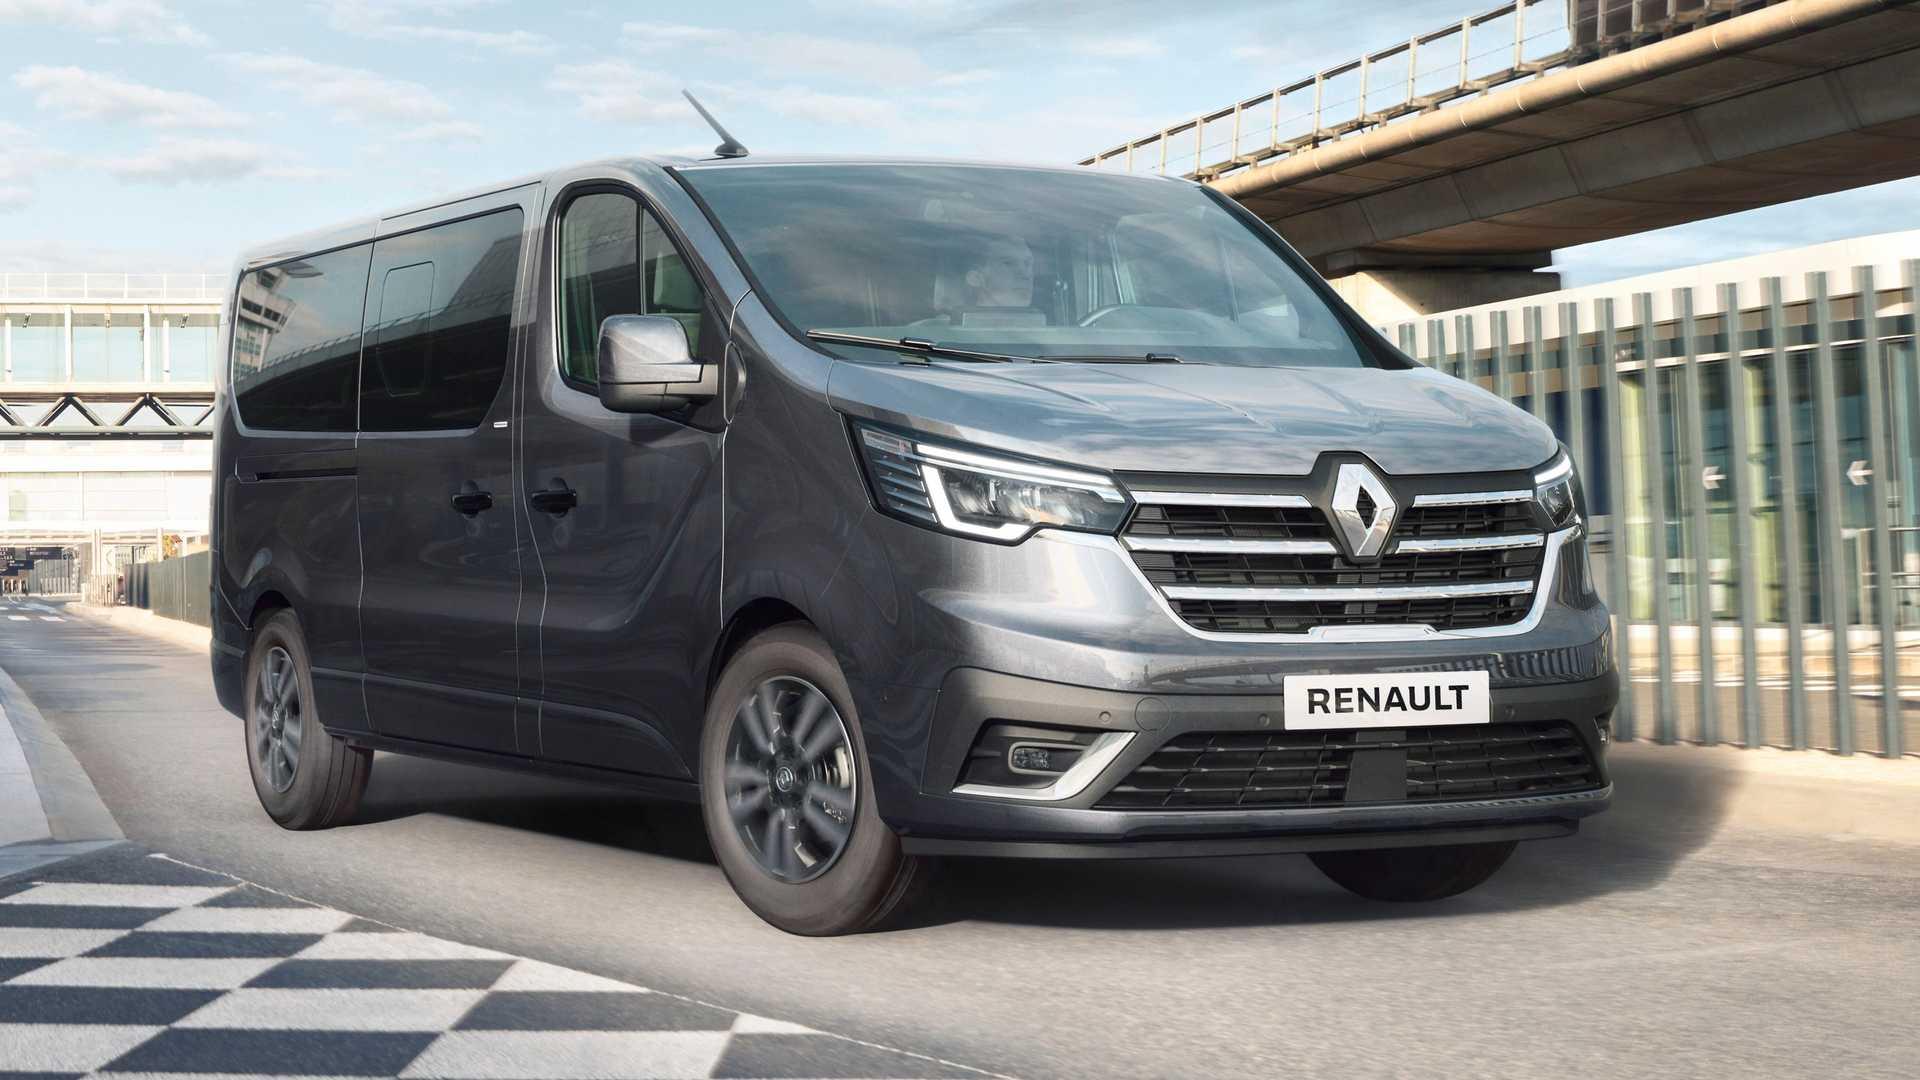 2020-renault-trafic-facelift-exterior (1)